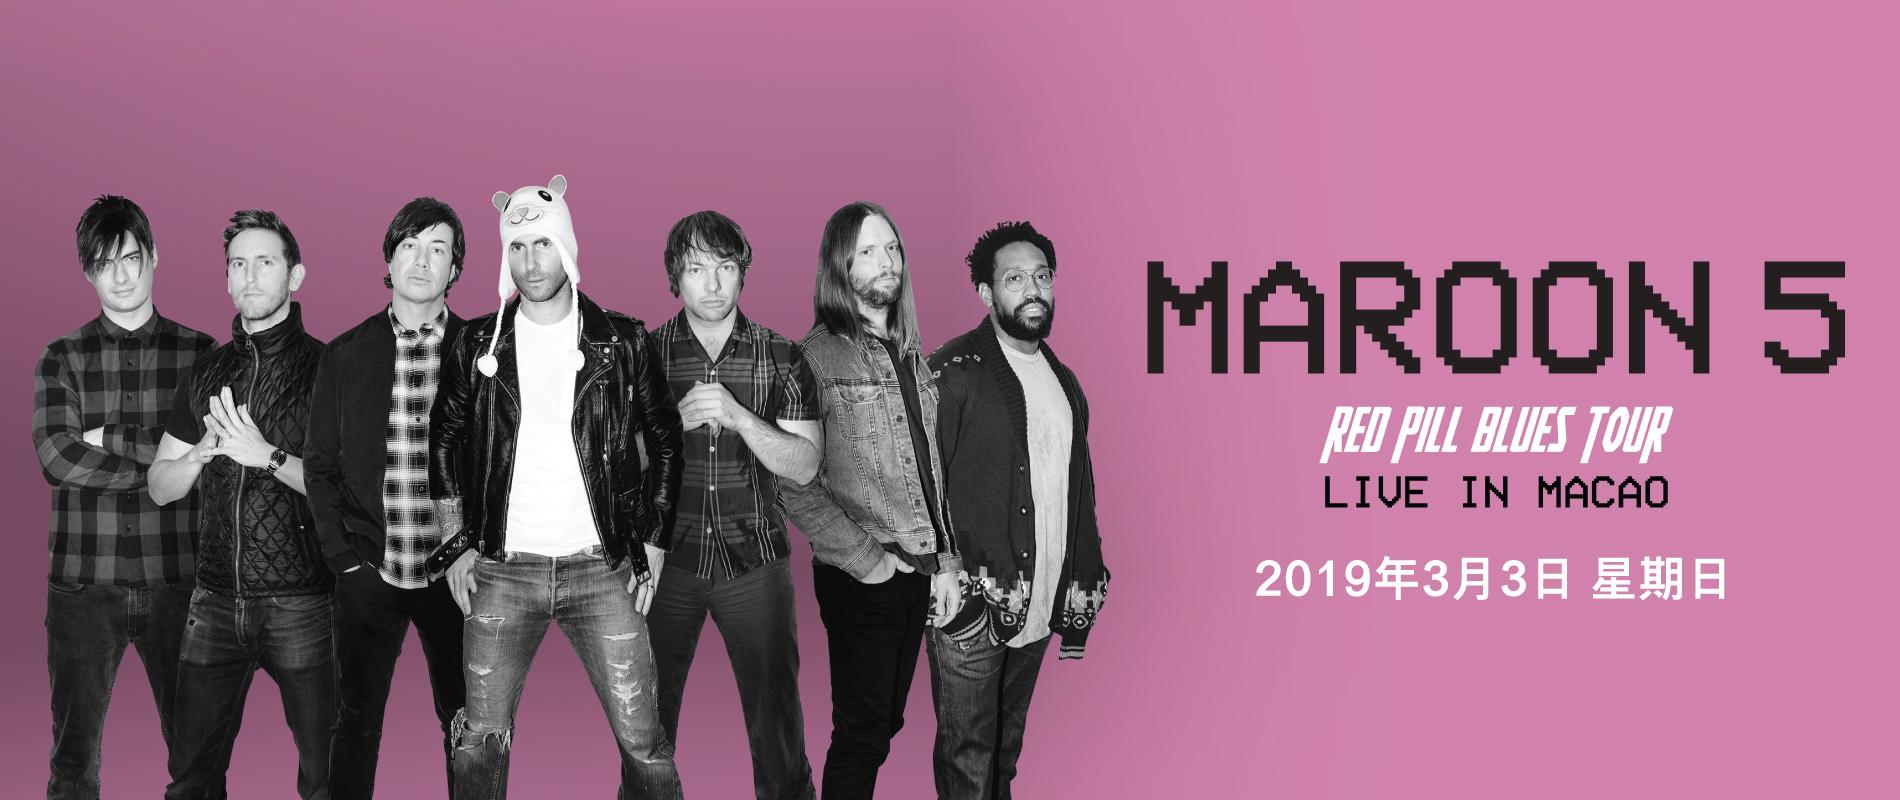 MAROON 5 RED PILL BLUES TOUR - 澳门威尼斯人金光综艺馆